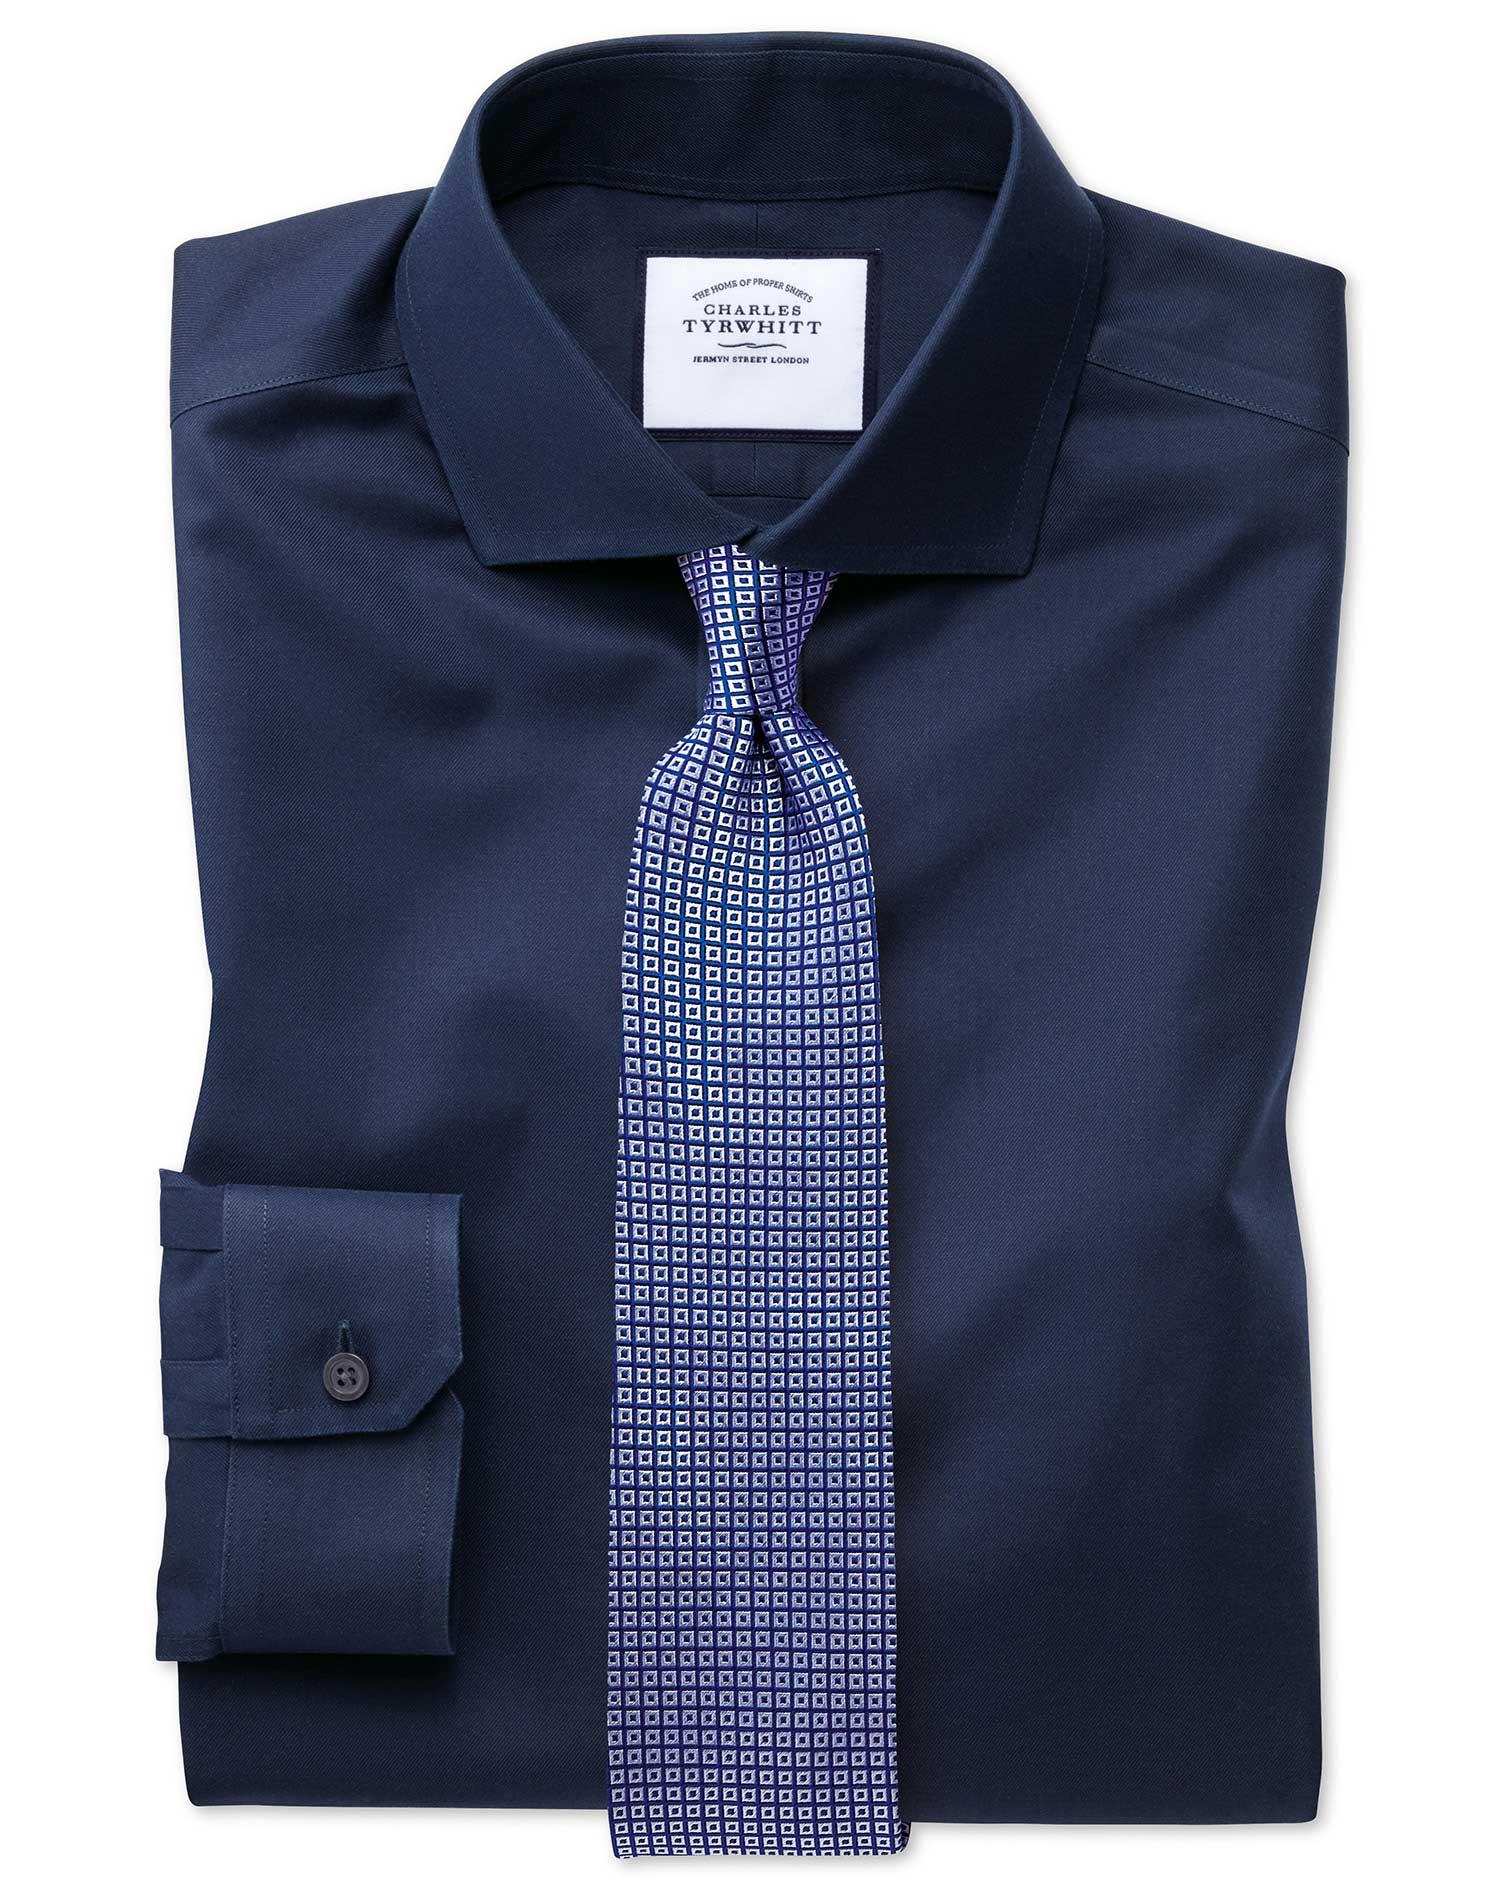 Cotton Super Slim Fit Navy Non-Iron Twill Shirt